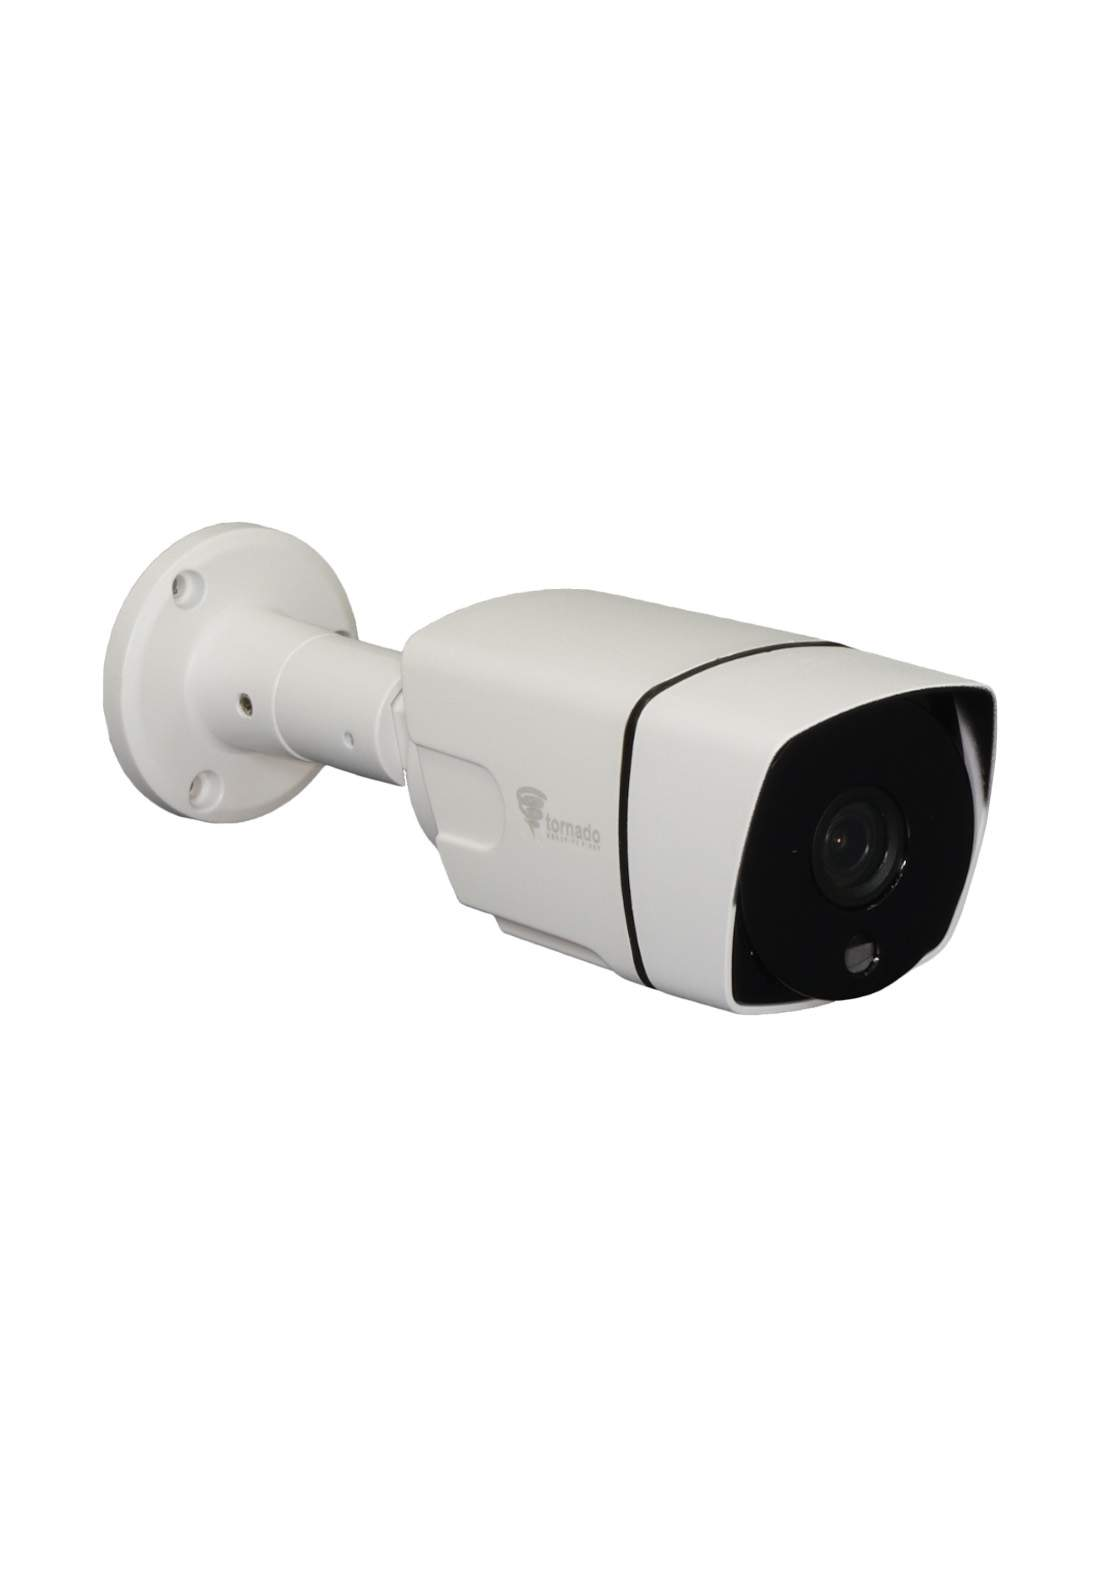 Tornado B-6001 AHD 2mp Security Camera - White  كاميرا مراقبة